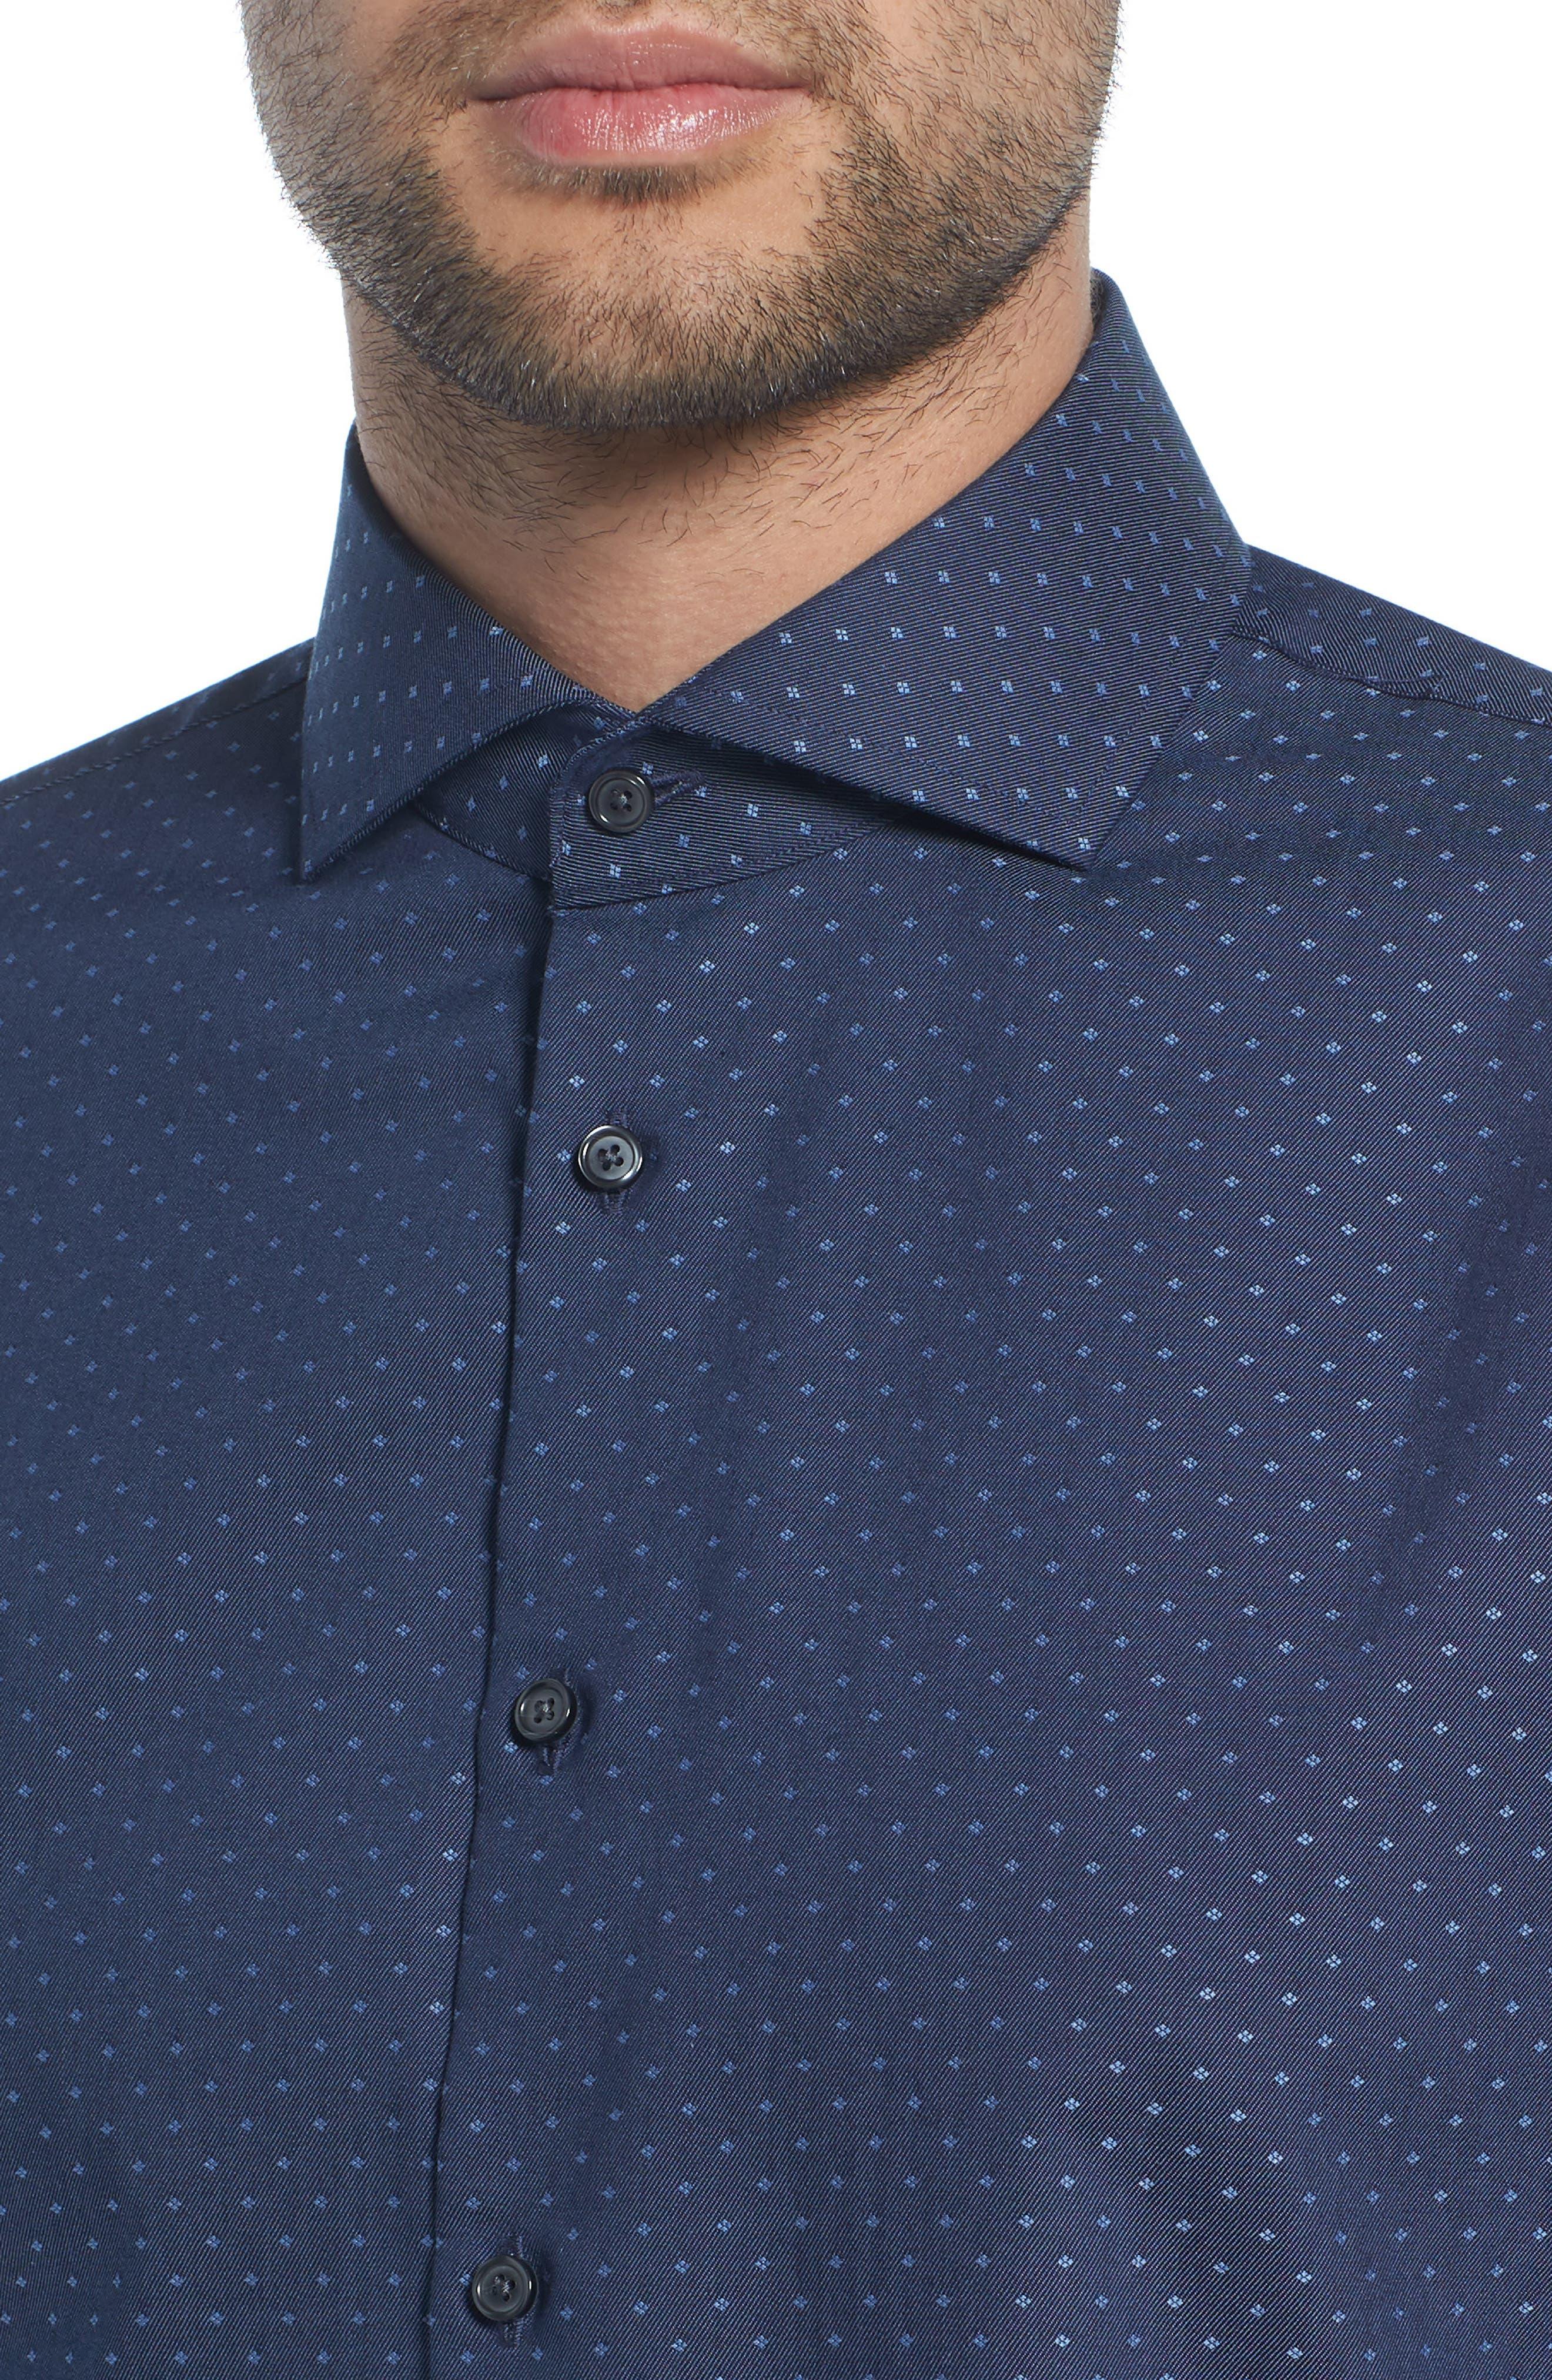 Extra Trim Fit Dot Dress Shirt,                             Alternate thumbnail 2, color,                             Navy Medieval